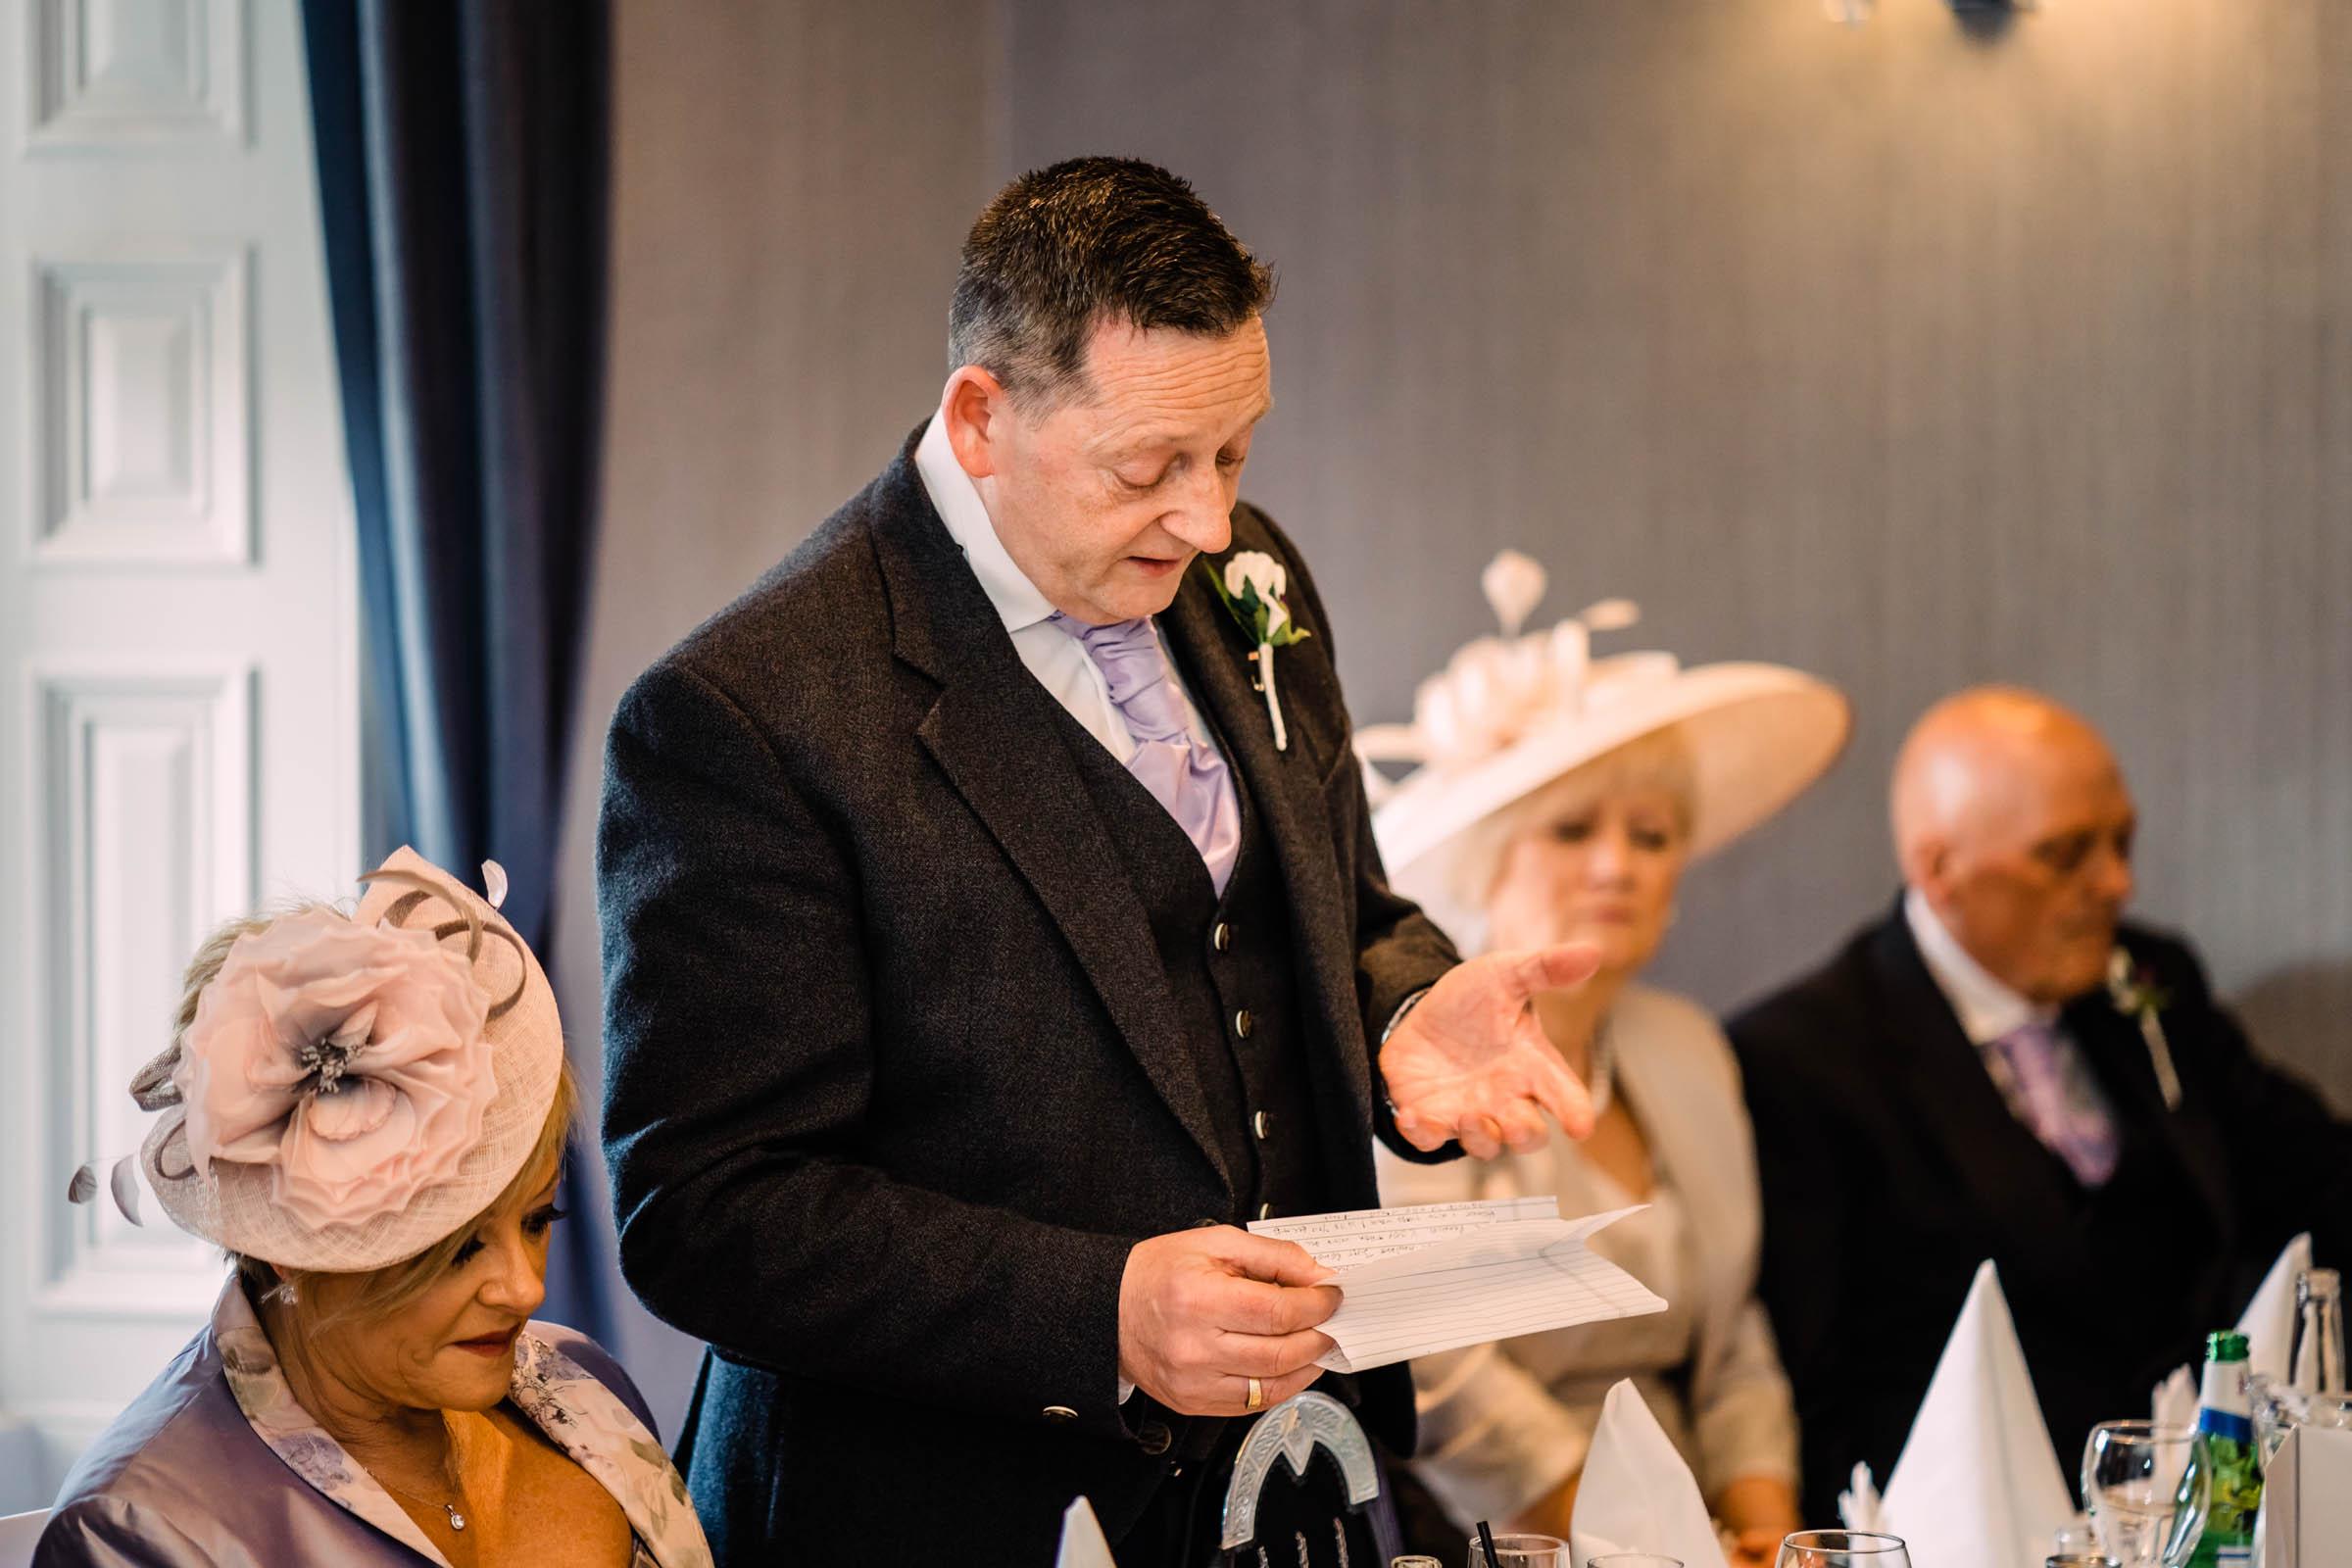 motherwell-moorings-wedding-photographer-dearlyphotography (64 of 77).jpg